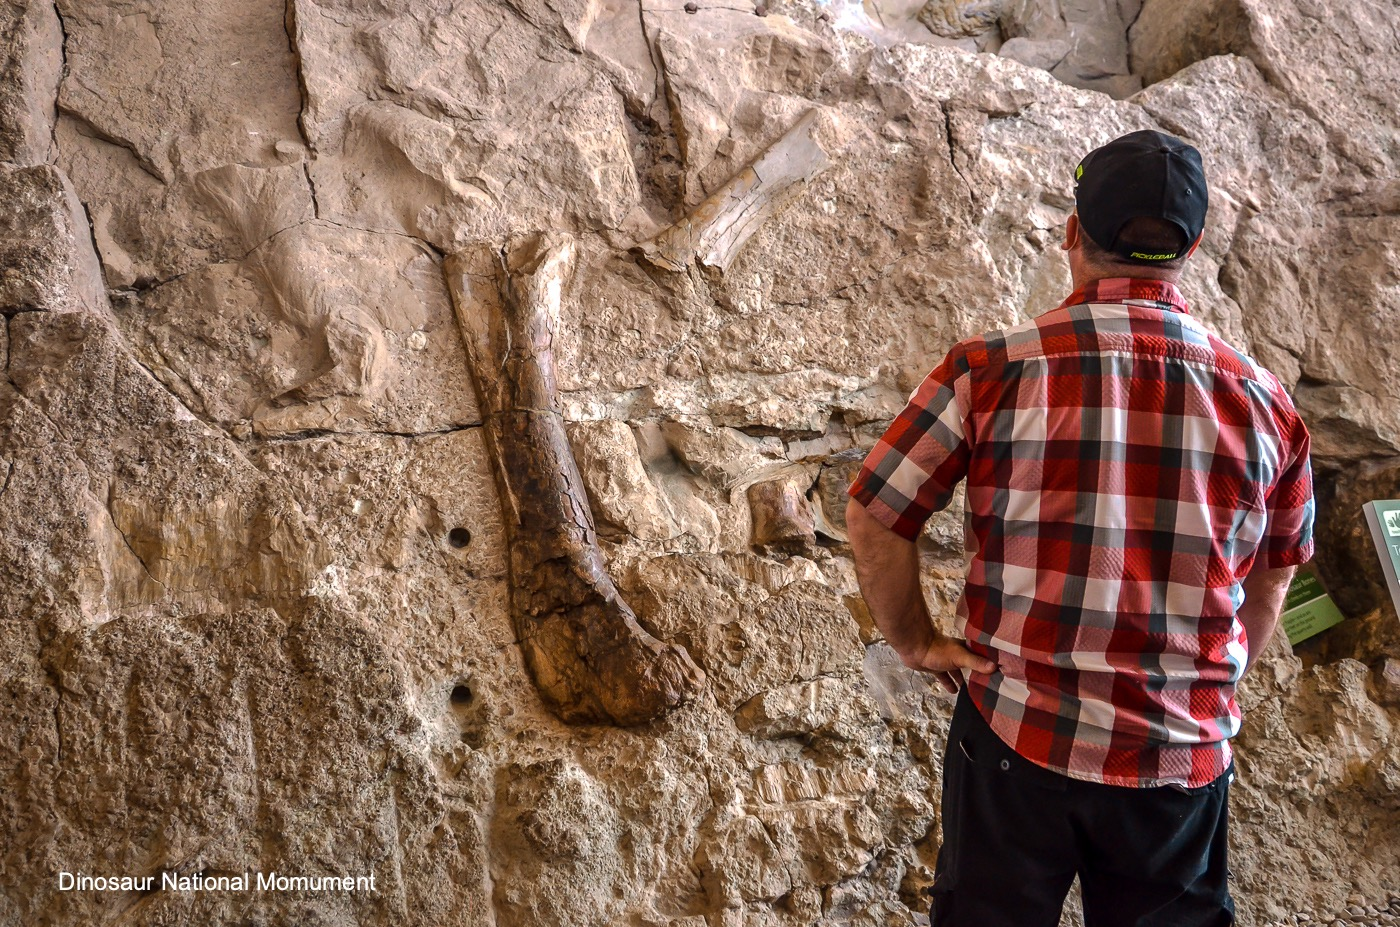 Dinosaur National Monument Fossils